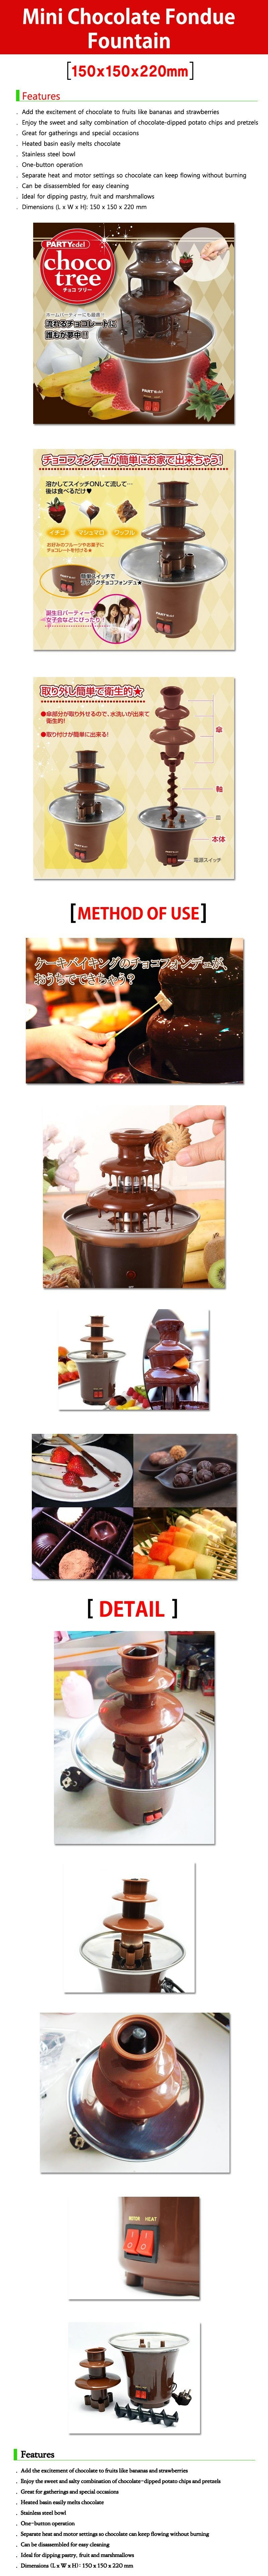 Portable Chocolate Fondue Machine Fountain Maker | Lazada Singapore